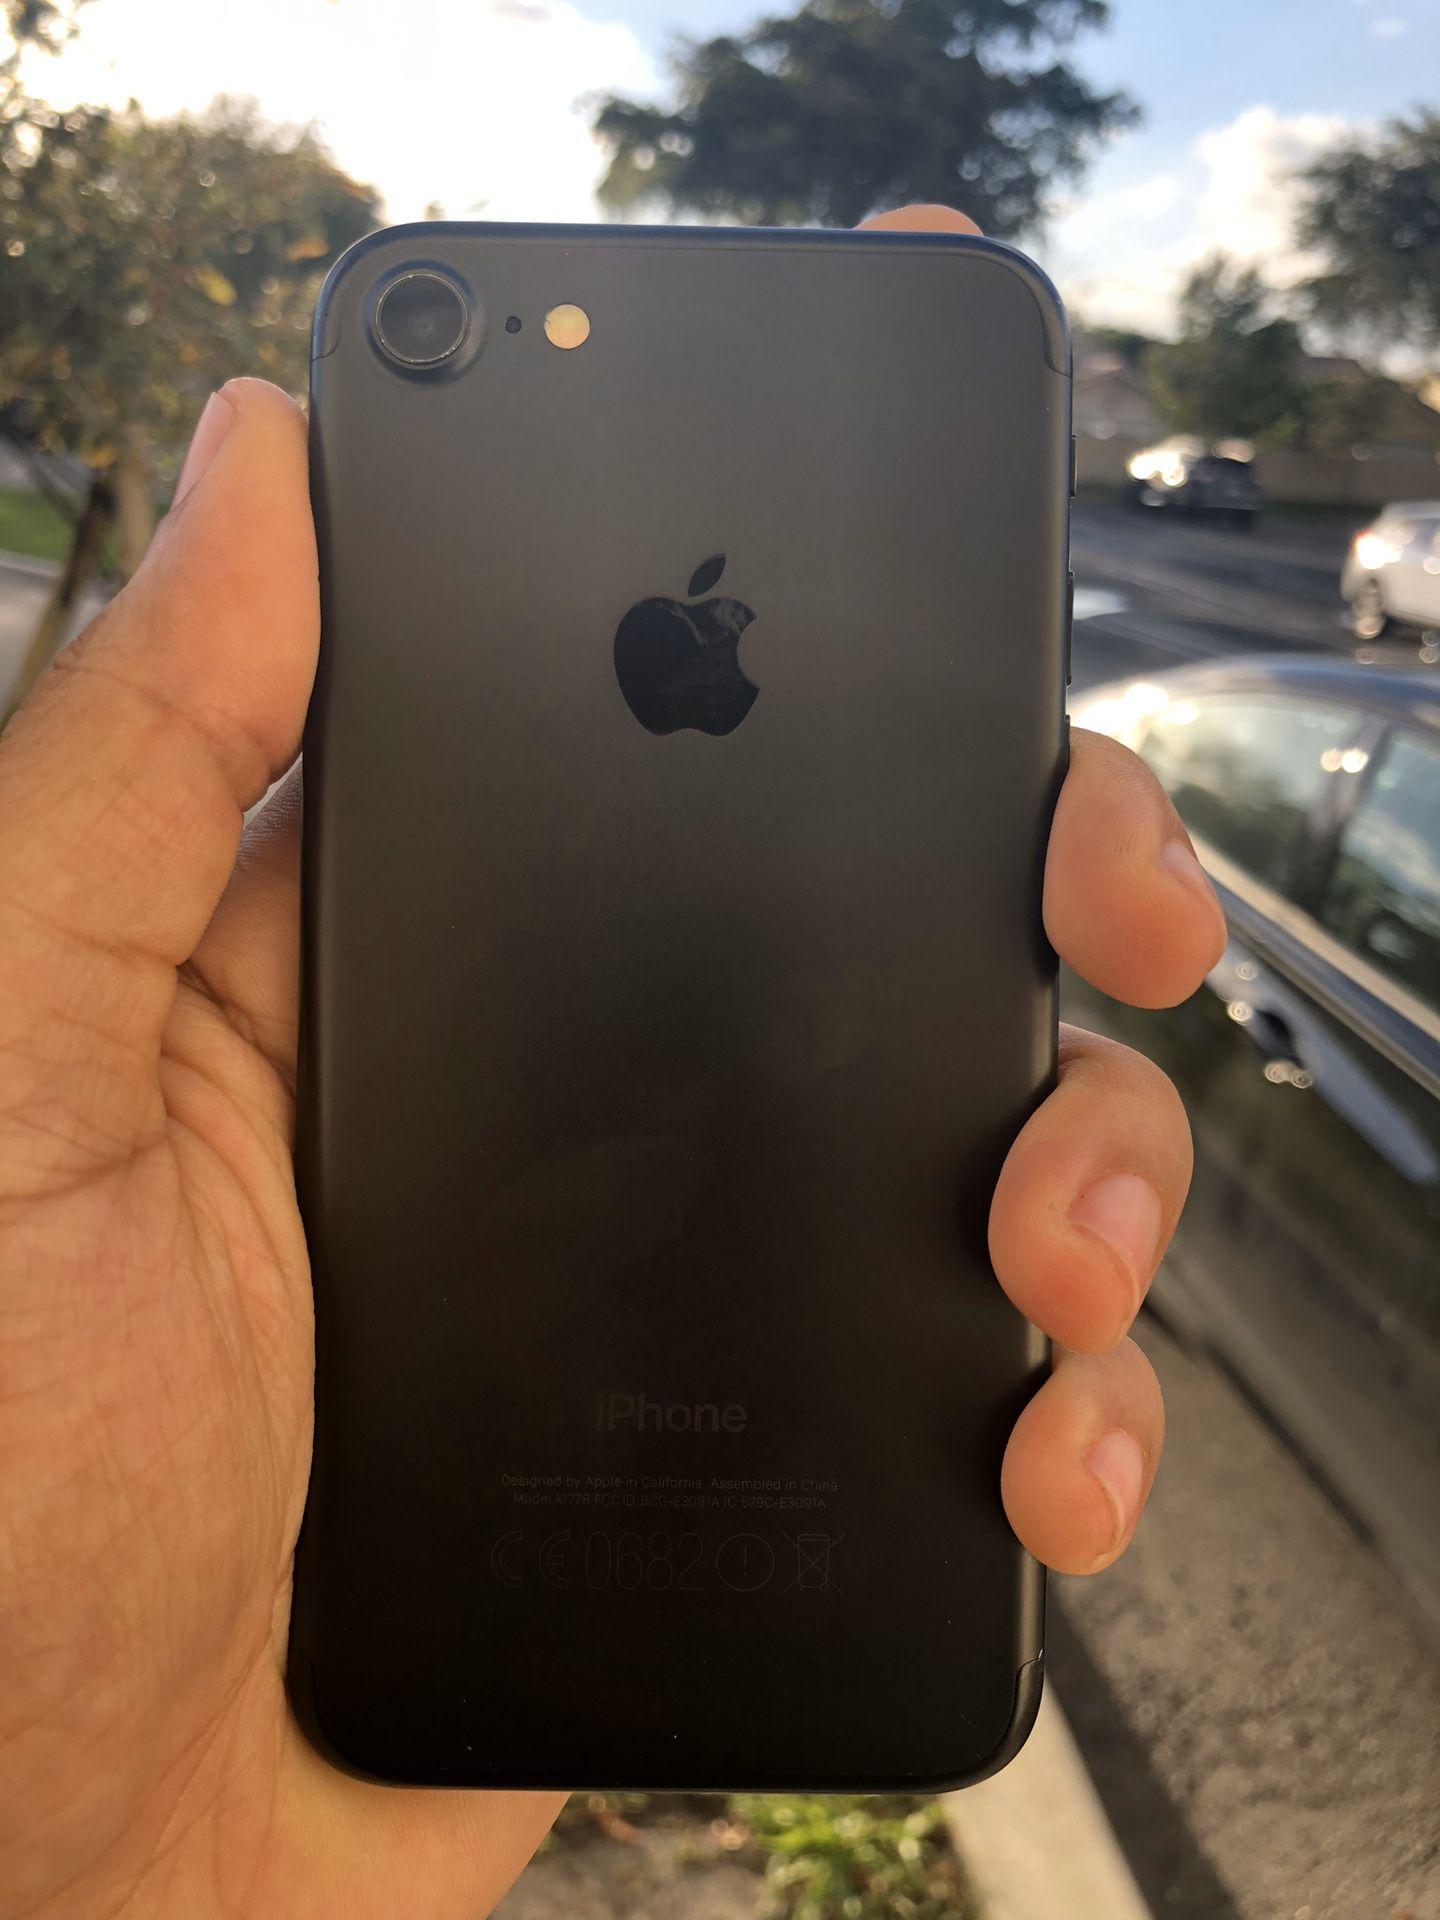 UNLOCKED IPHONE 7 32Gb / LIMITED STOCK ❗️